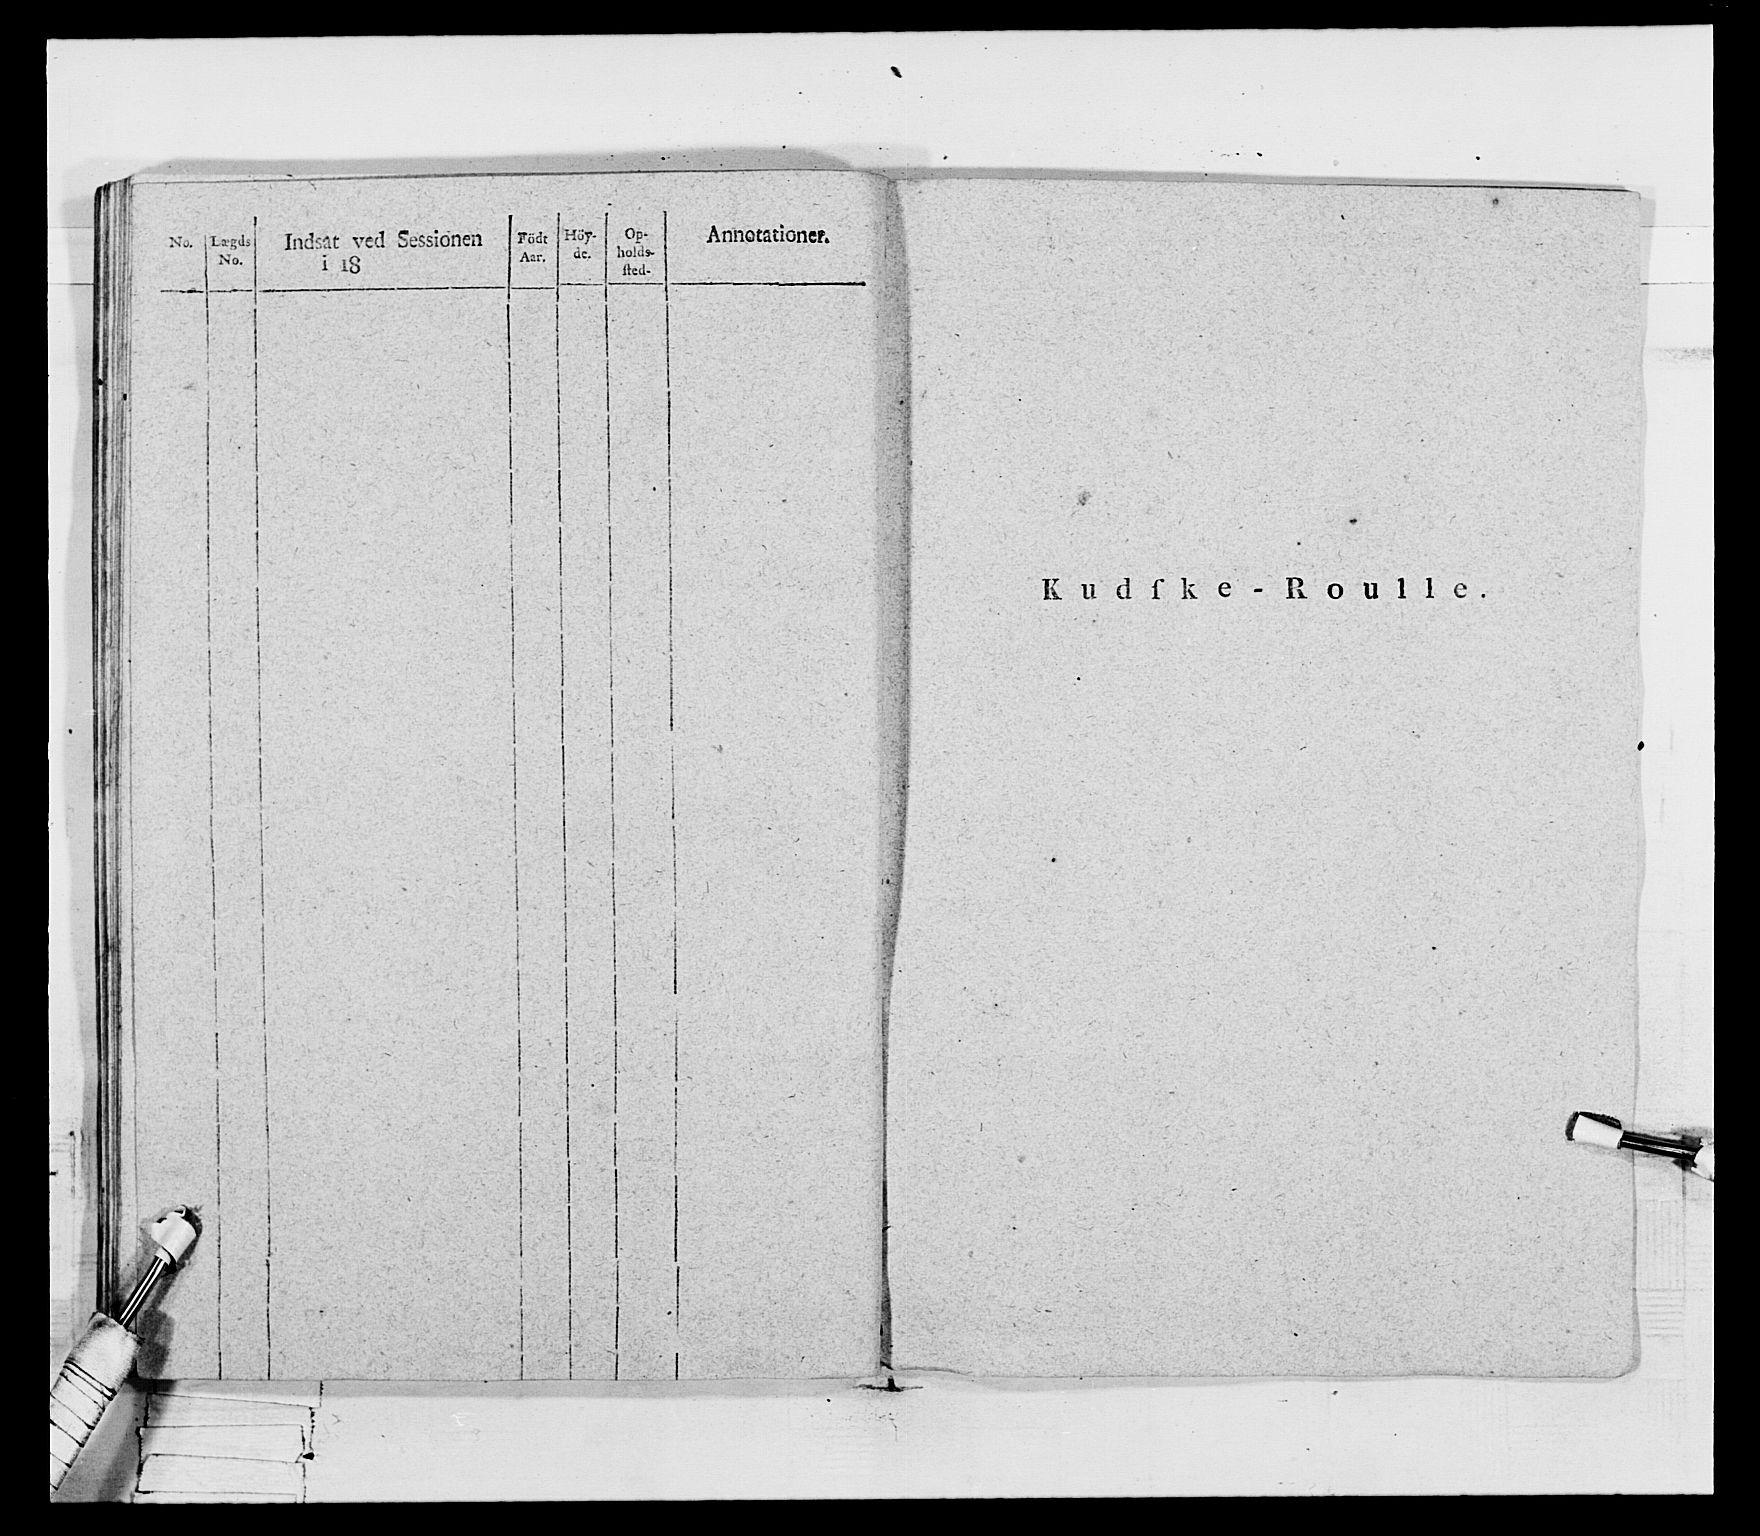 RA, Generalitets- og kommissariatskollegiet, Det kongelige norske kommissariatskollegium, E/Eh/L0069: Opplandske gevorbne infanteriregiment, 1810-1818, p. 150